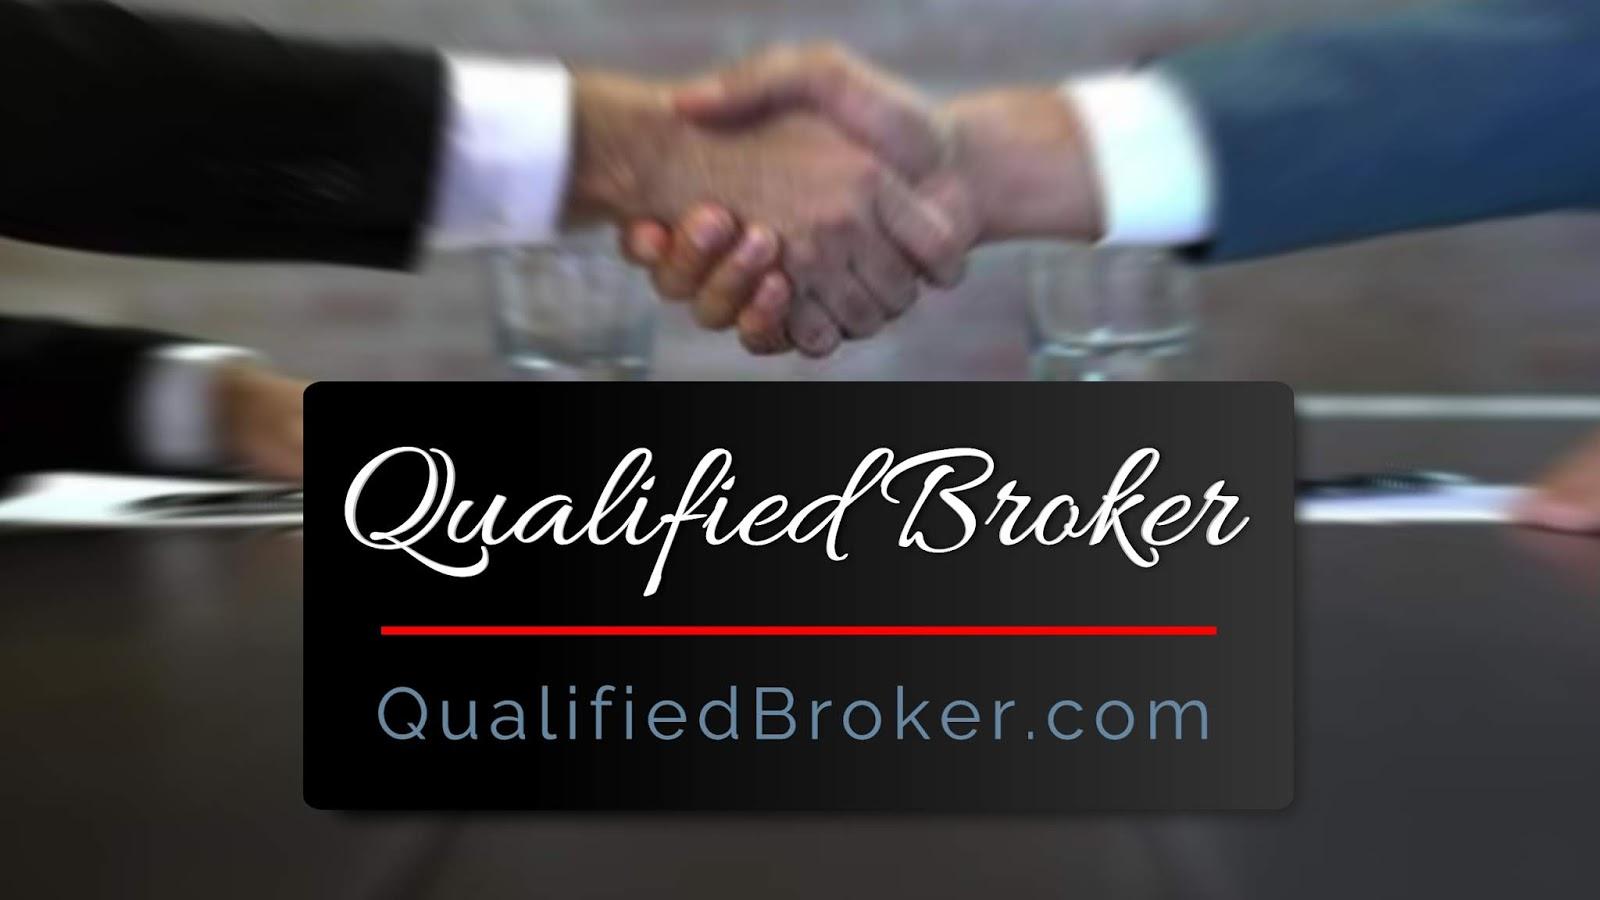 Qualified Broker